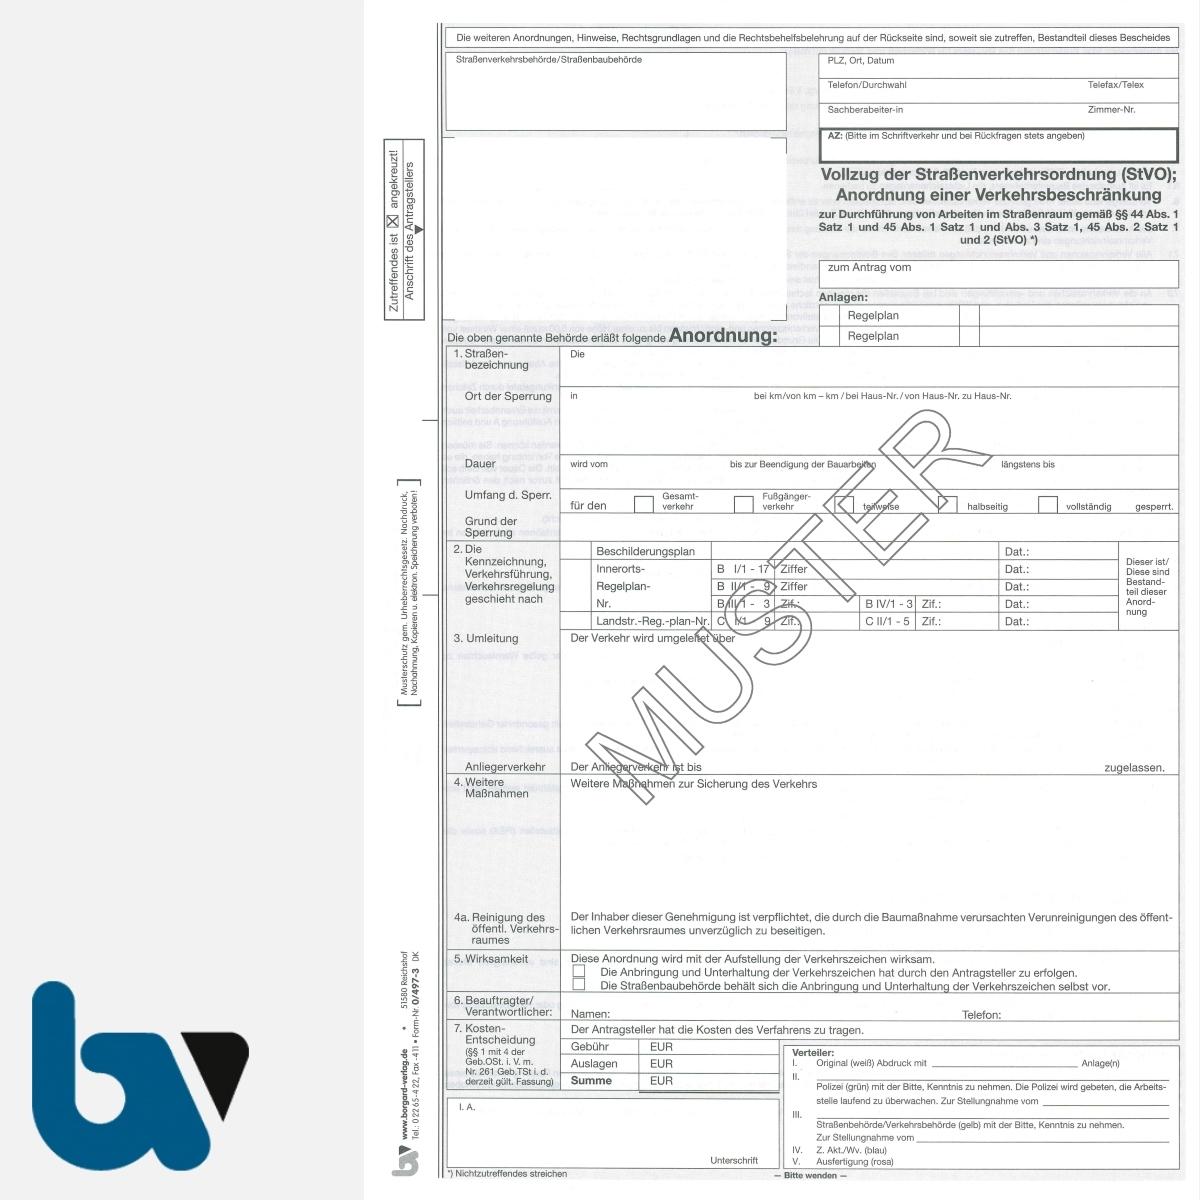 0/497-3 Anordnung Verkehrsbeschränkung Vollzug 44 45 Straßenverkehrsordnung StVO Arbeiten Verkehrsraum Straßenraum selbstdurchschreibend DIN A4 5-fach VS | Borgard Verlag GmbH